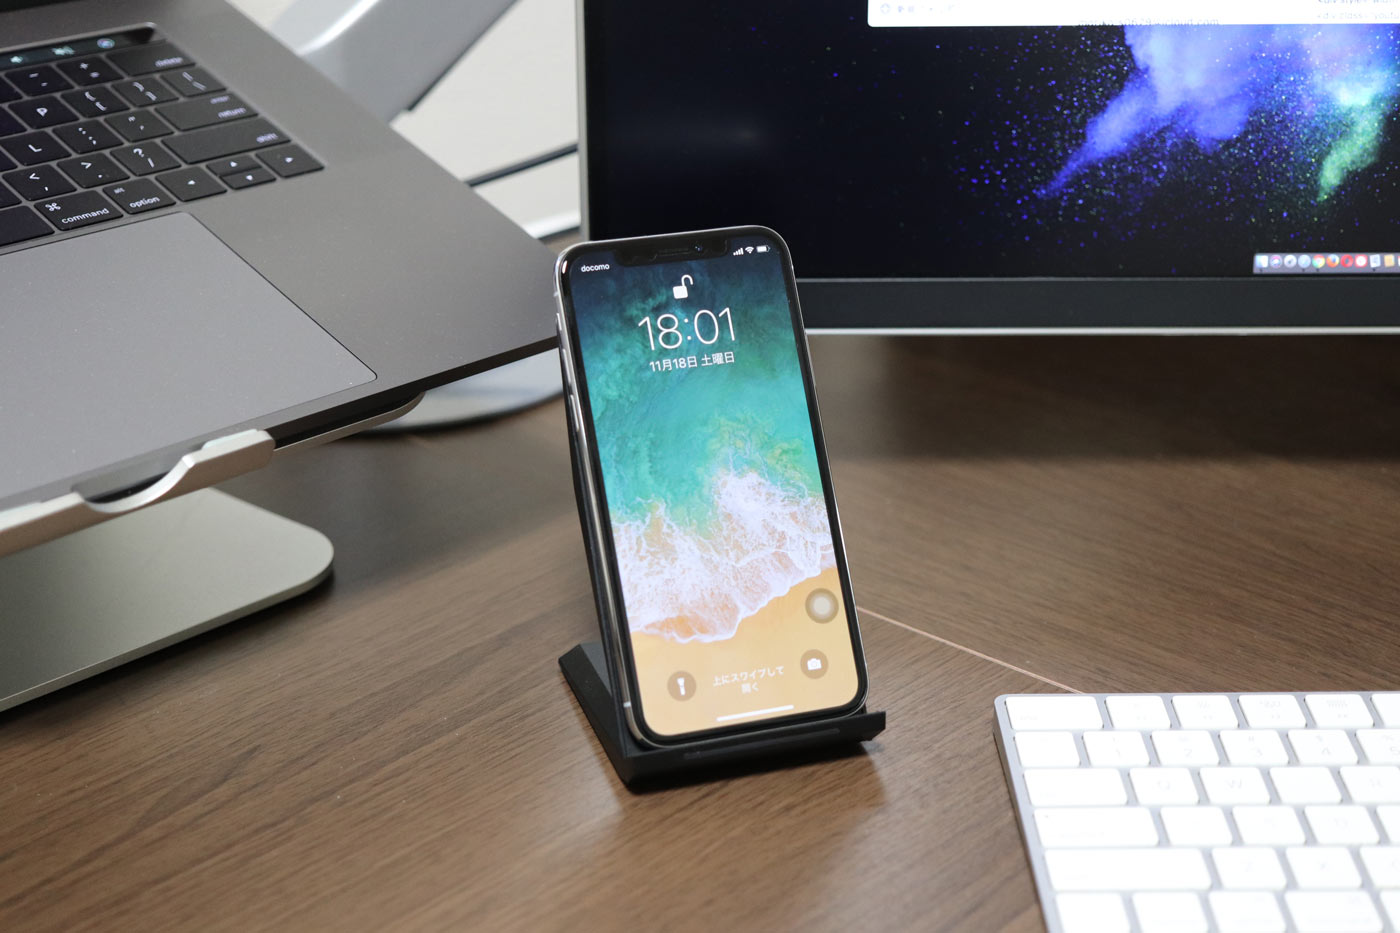 iPhoneX スタンド